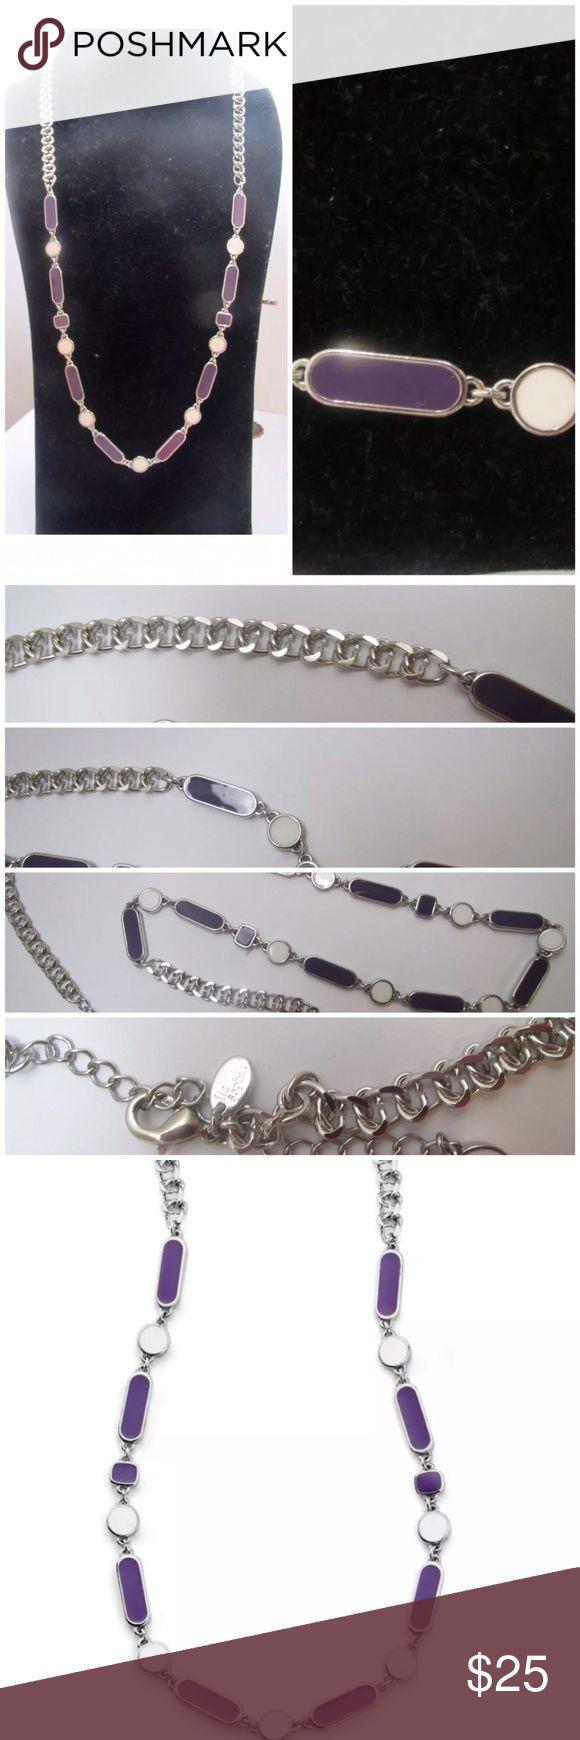 "Lia Sophia Skip A Beat Necklace By Lia Sophia sophisticated 30-33"" Length Necklace Lia Sophia Jewelry Necklaces"